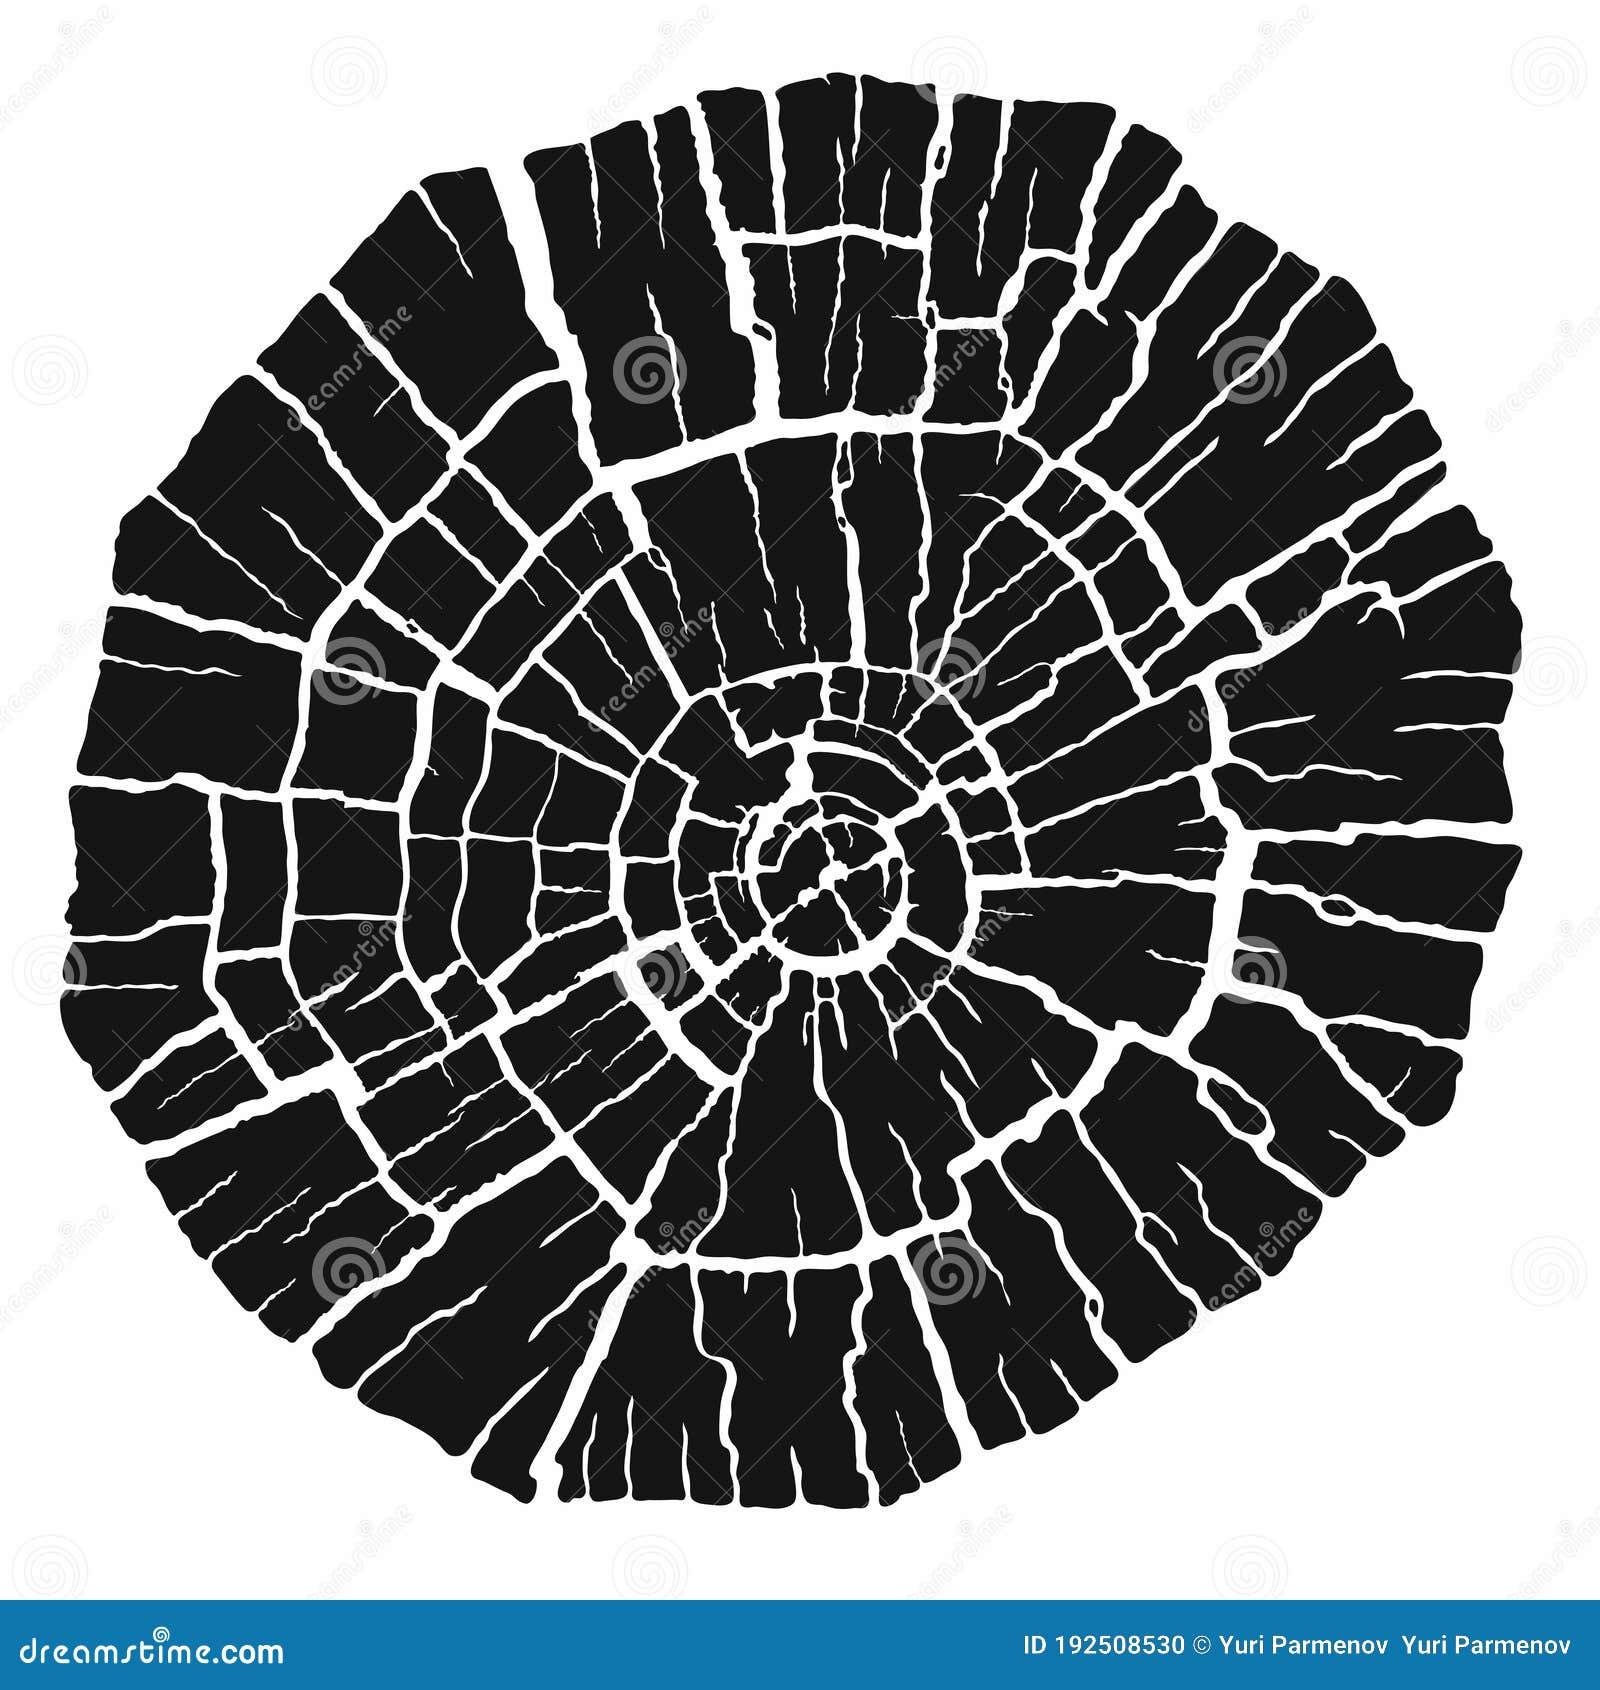 Black White Tree Stump Rings Stock Illustrations 271 Black White Tree Stump Rings Stock Illustrations Vectors Clipart Dreamstime